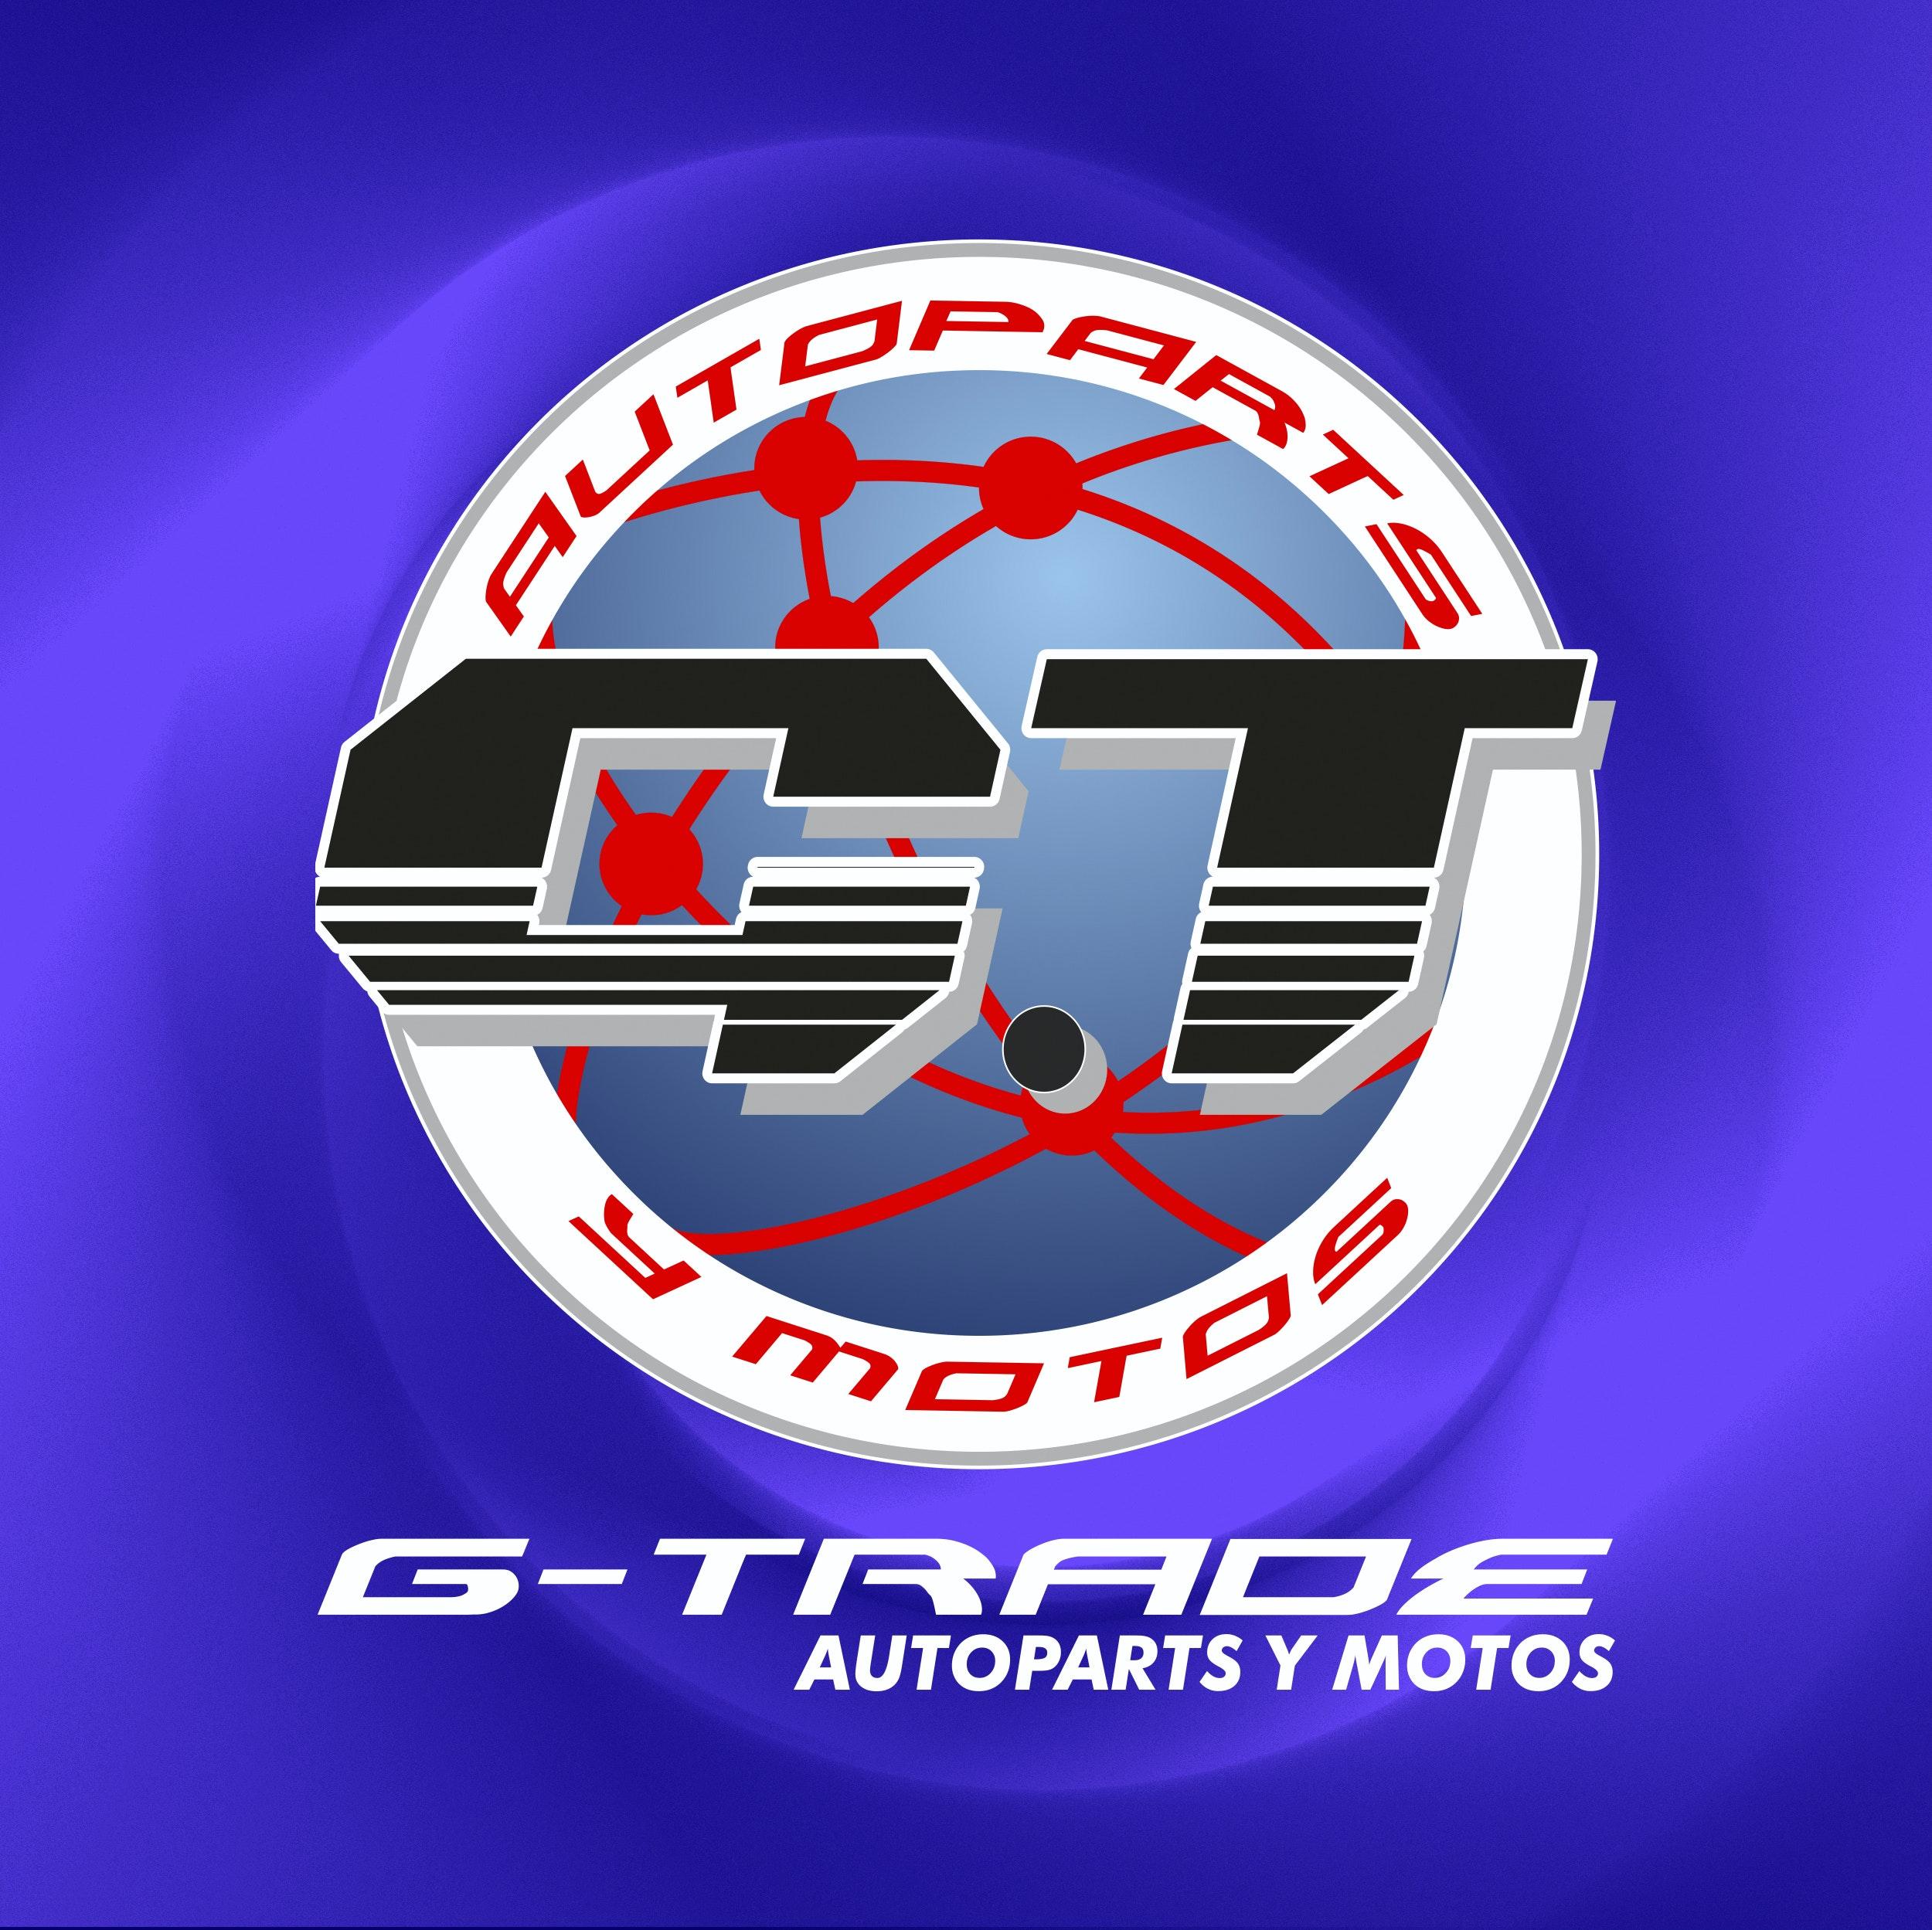 Logotipo de Gtrade Autoparts